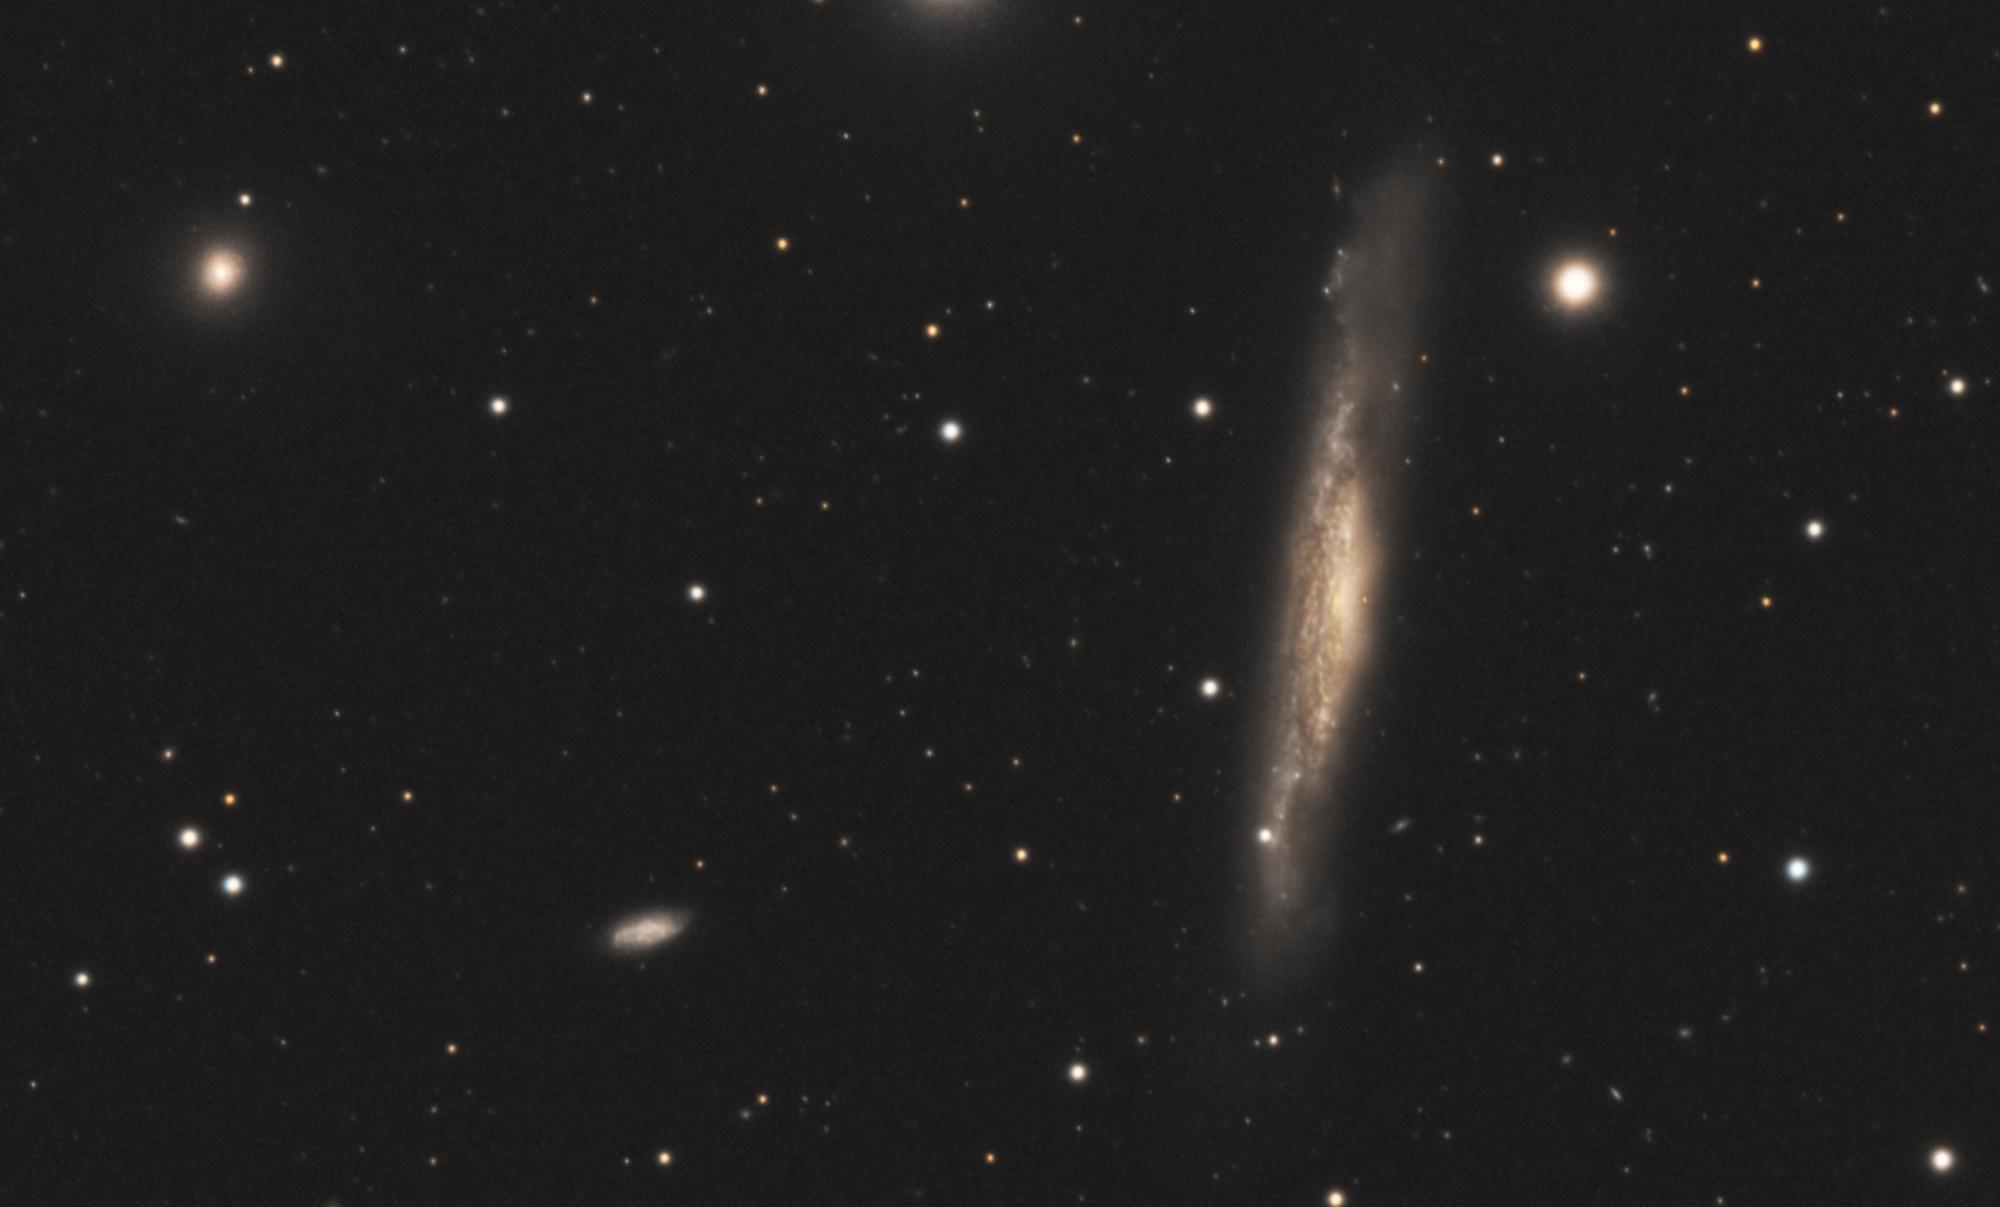 NGC_3079_crop.thumb.jpg.e4130f03211fc3be7650d4b999ea3bfc.jpg